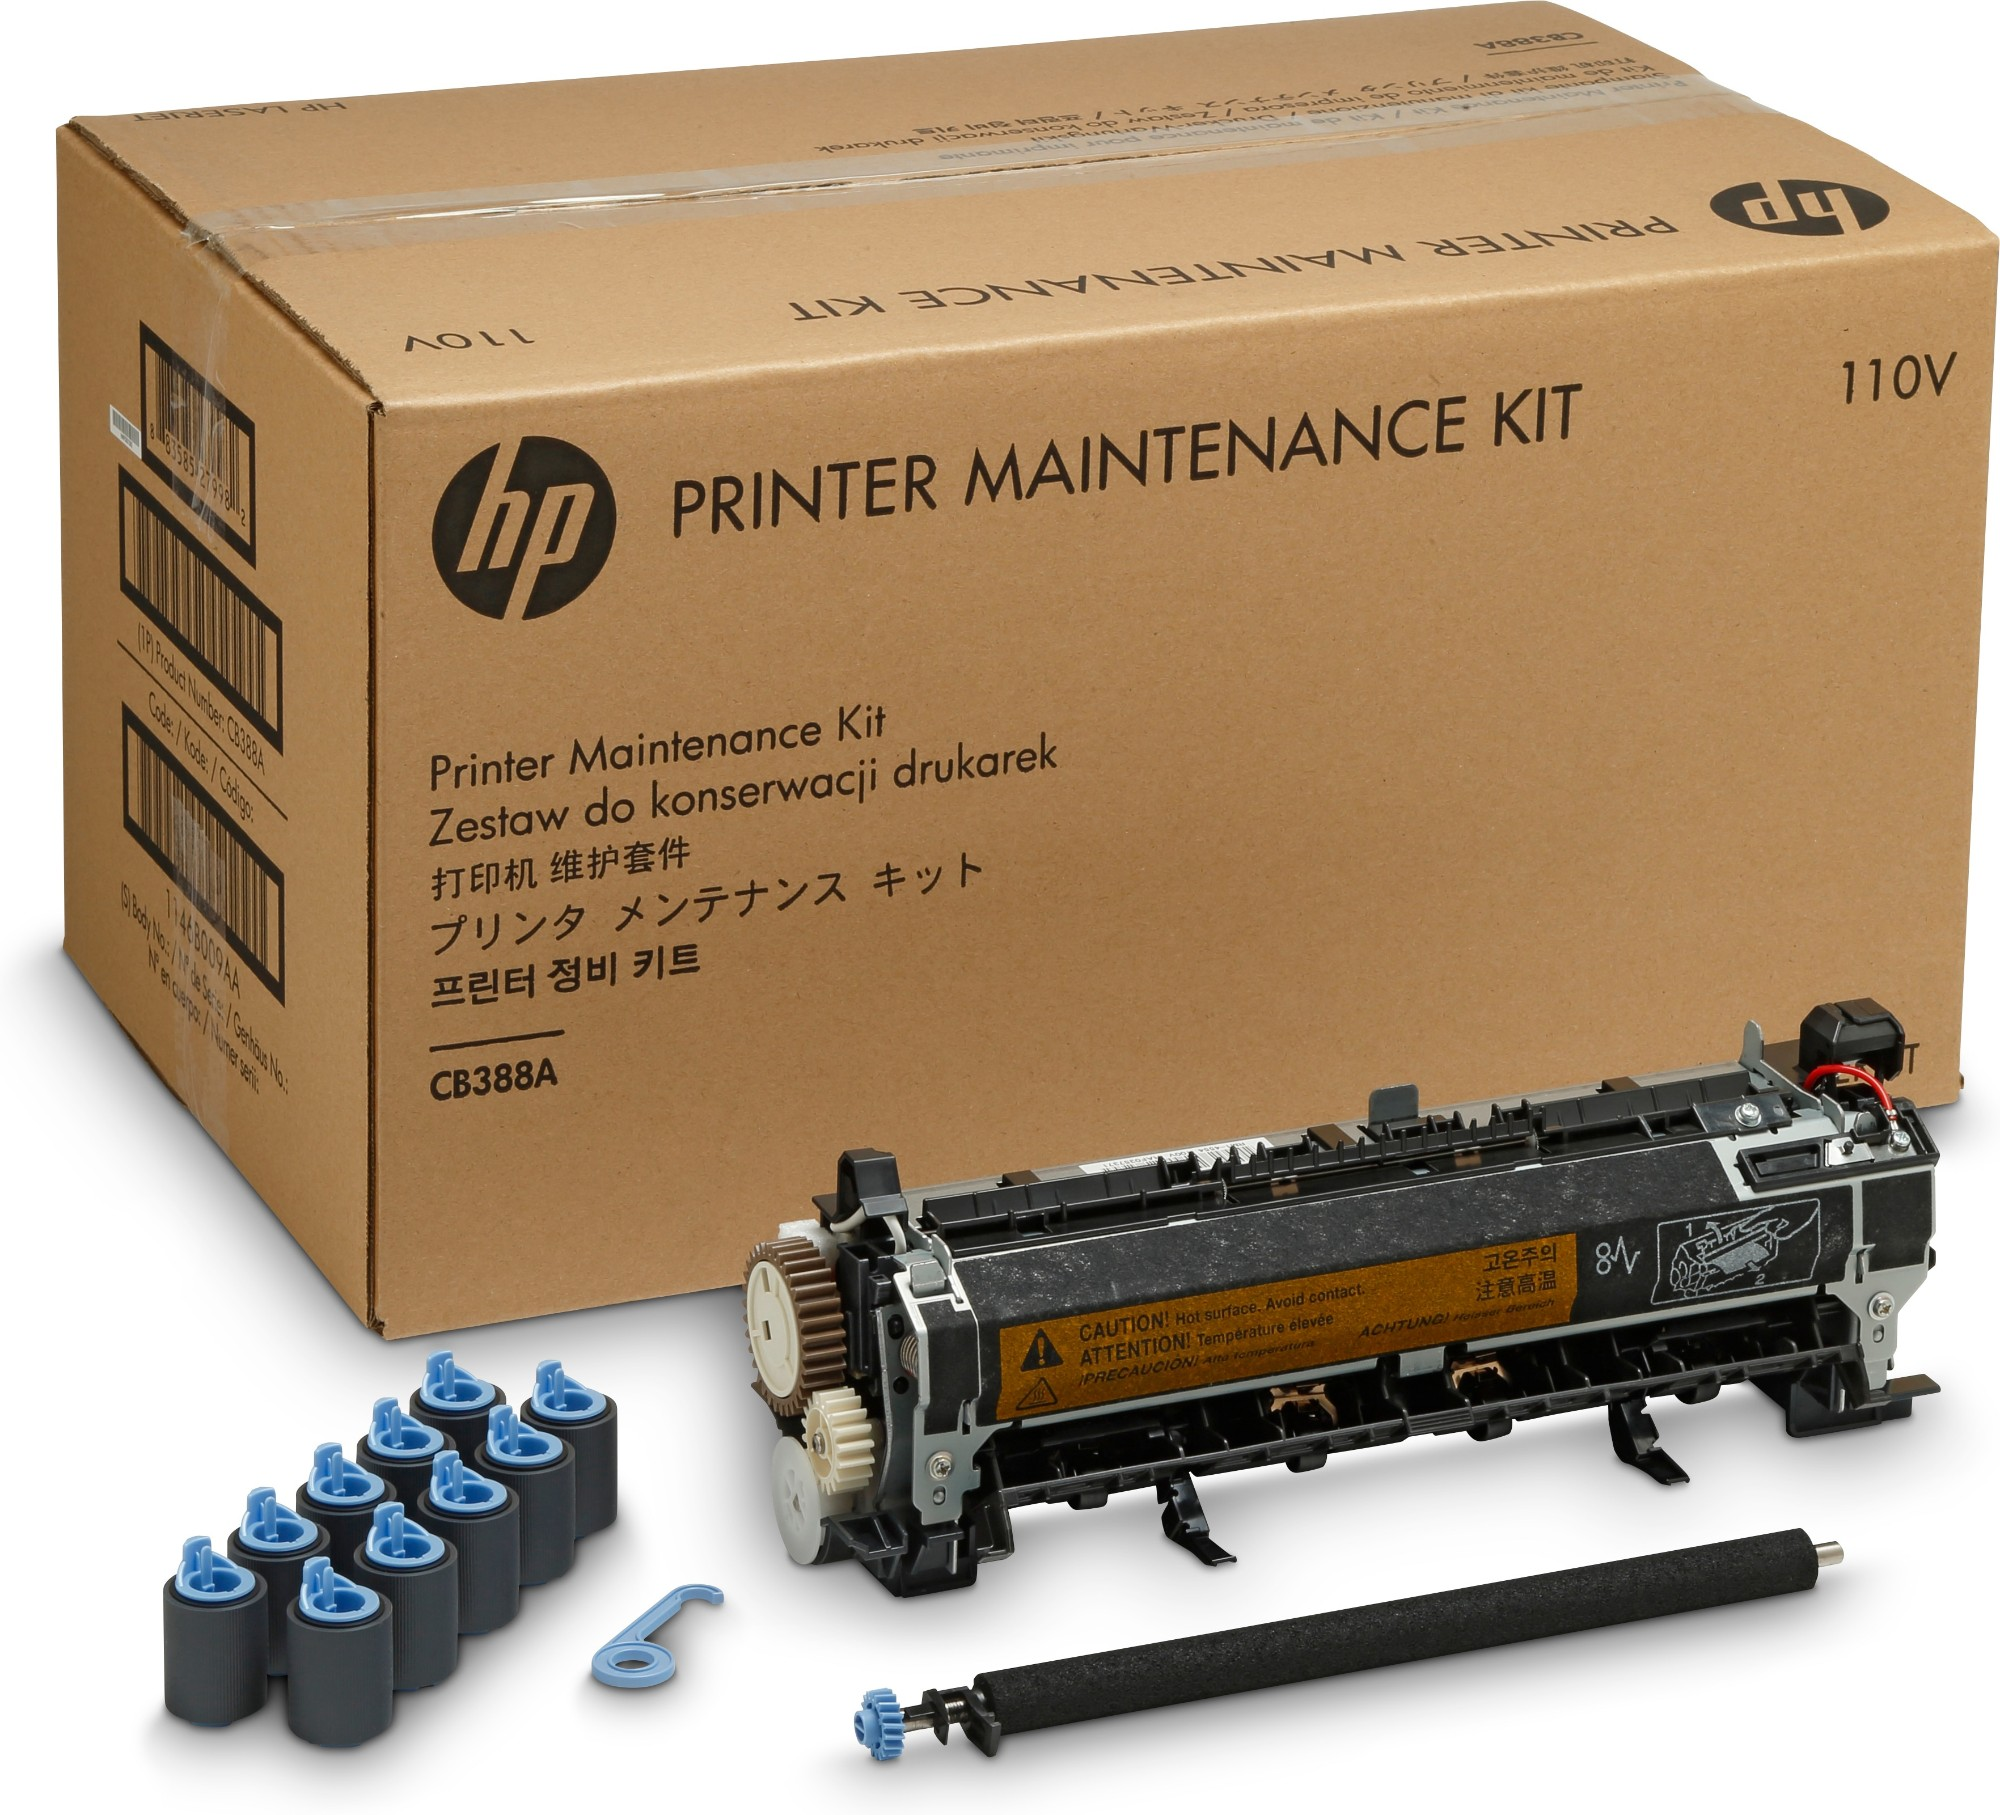 HP CB389A Service-Kit, 225K pages